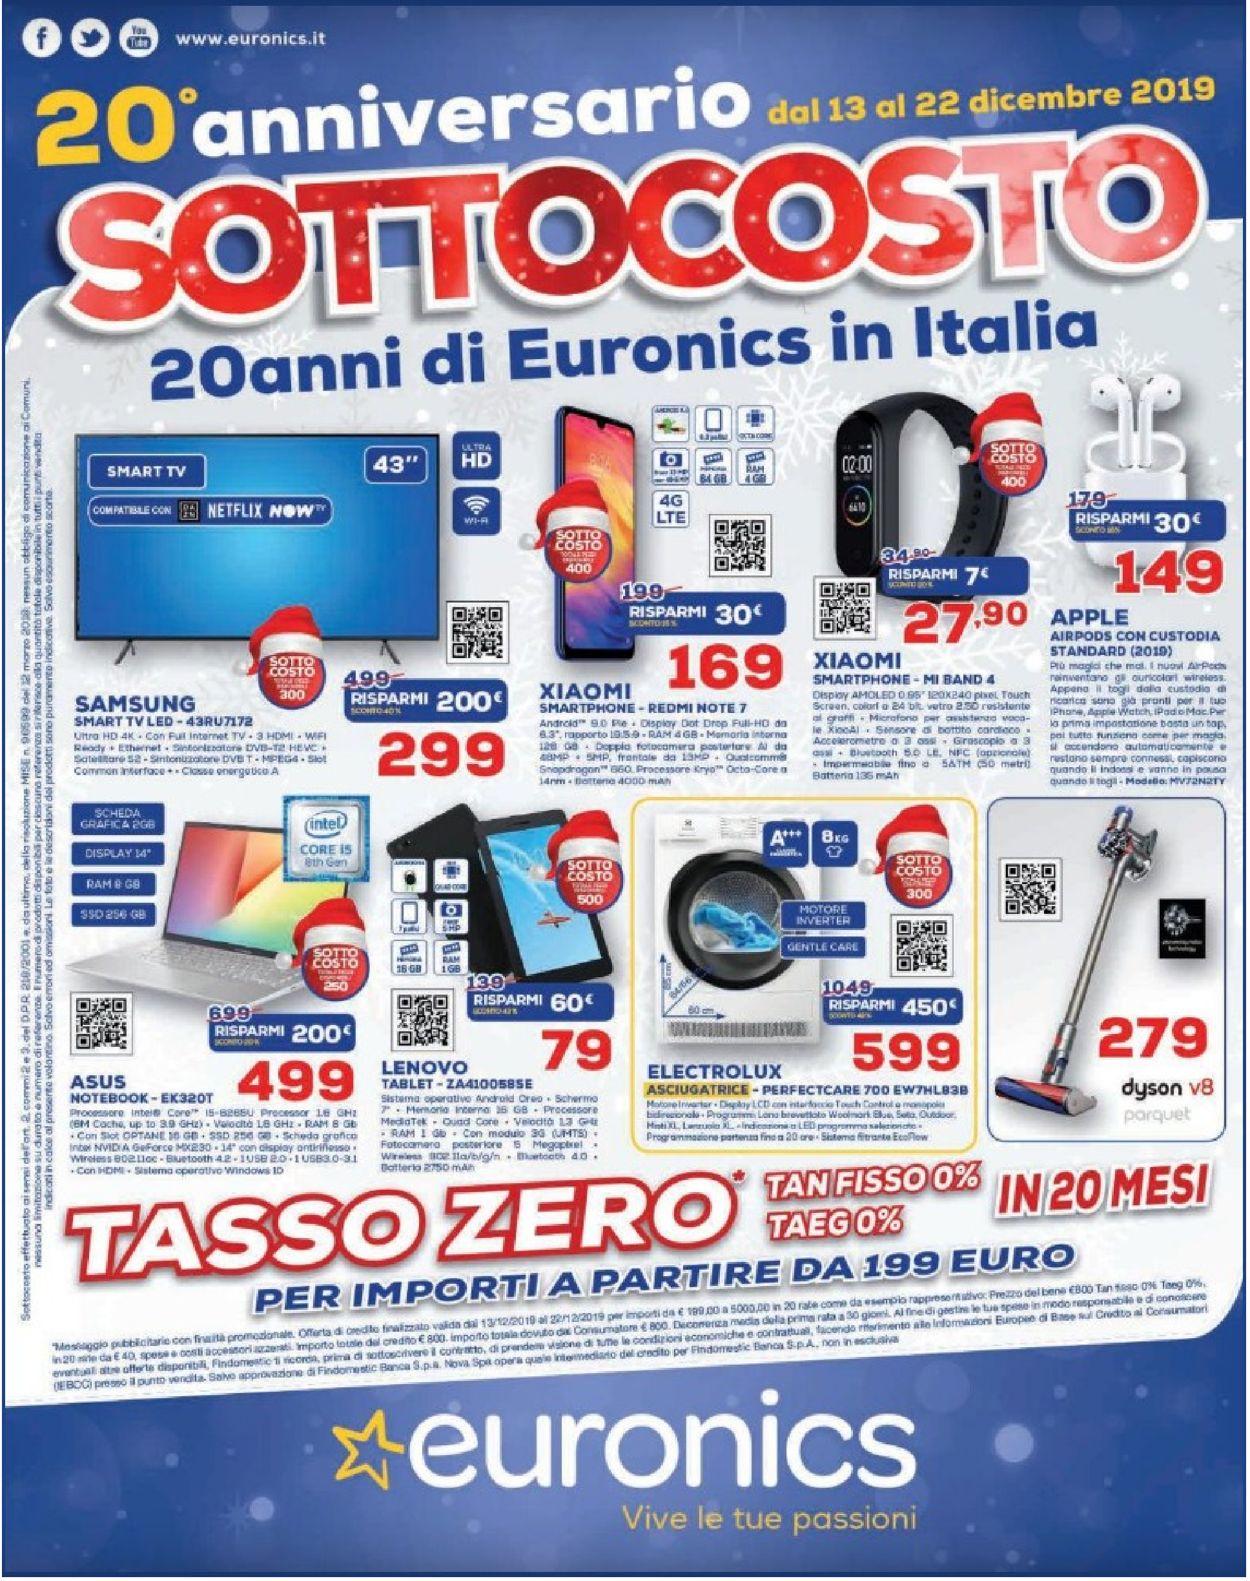 Volantino Euronics - Offerte 13/12-22/12/2019